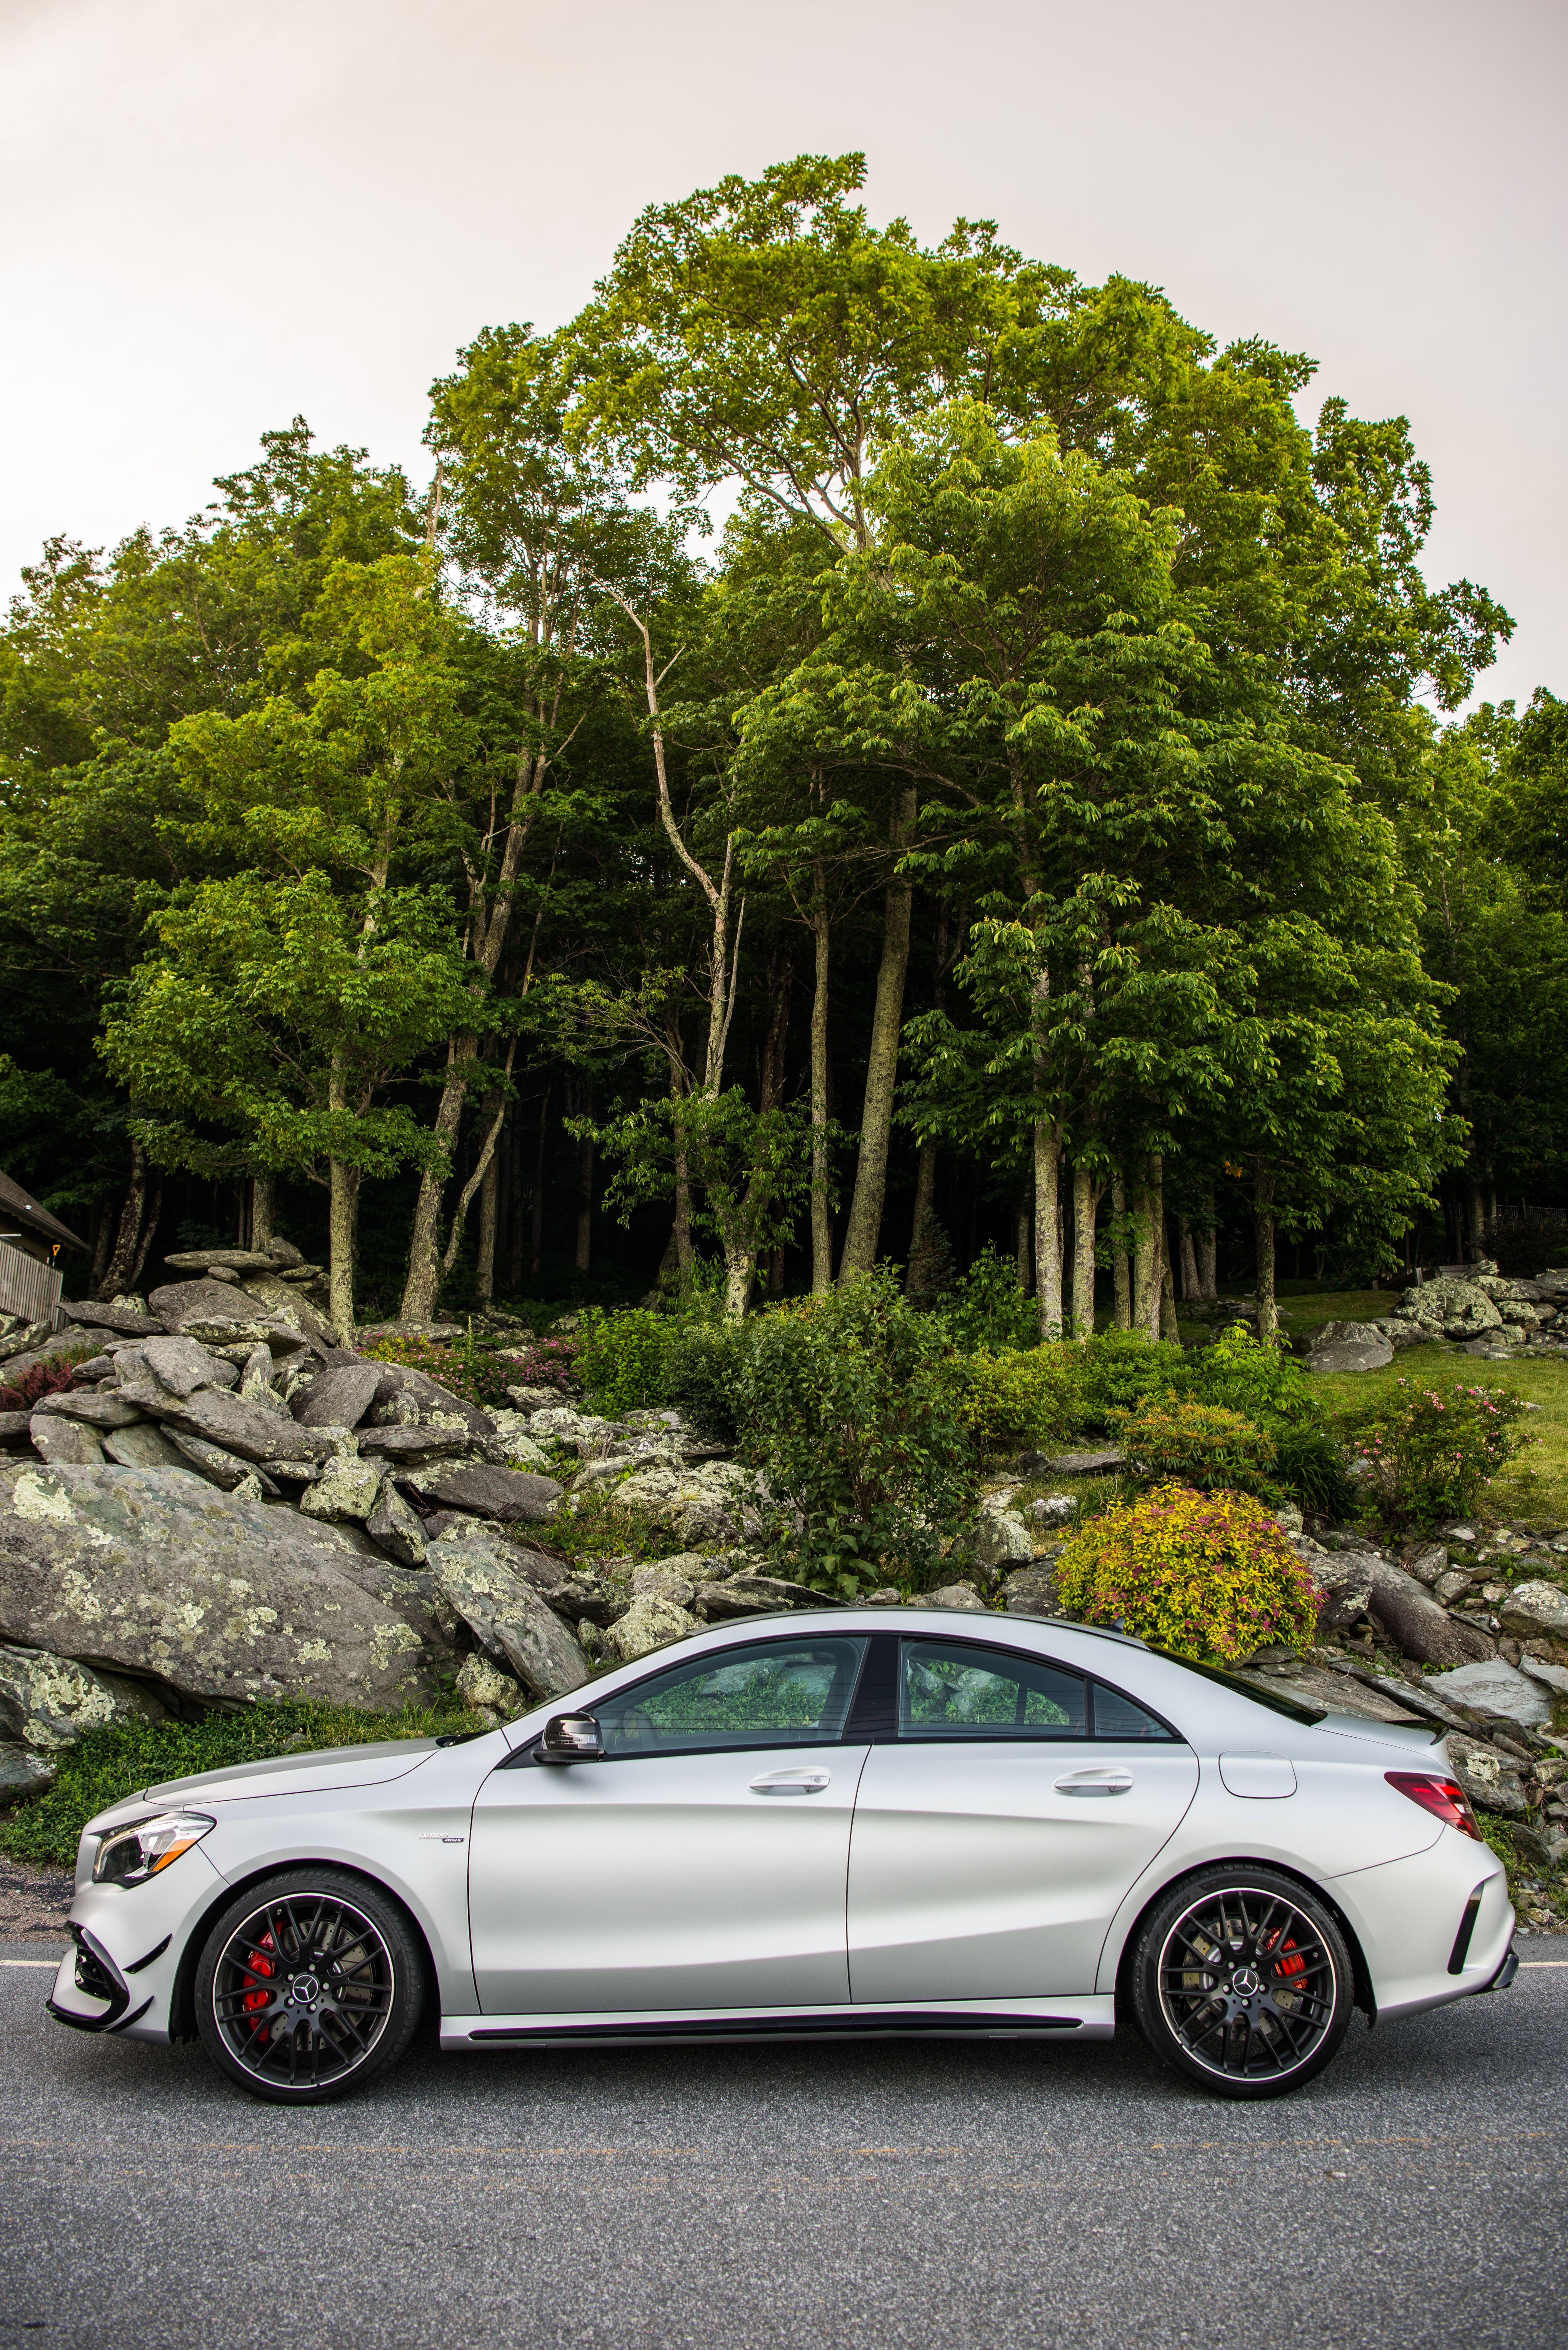 Design Meets Driving Performance The New MercedesAMG CLA - Car meets near me